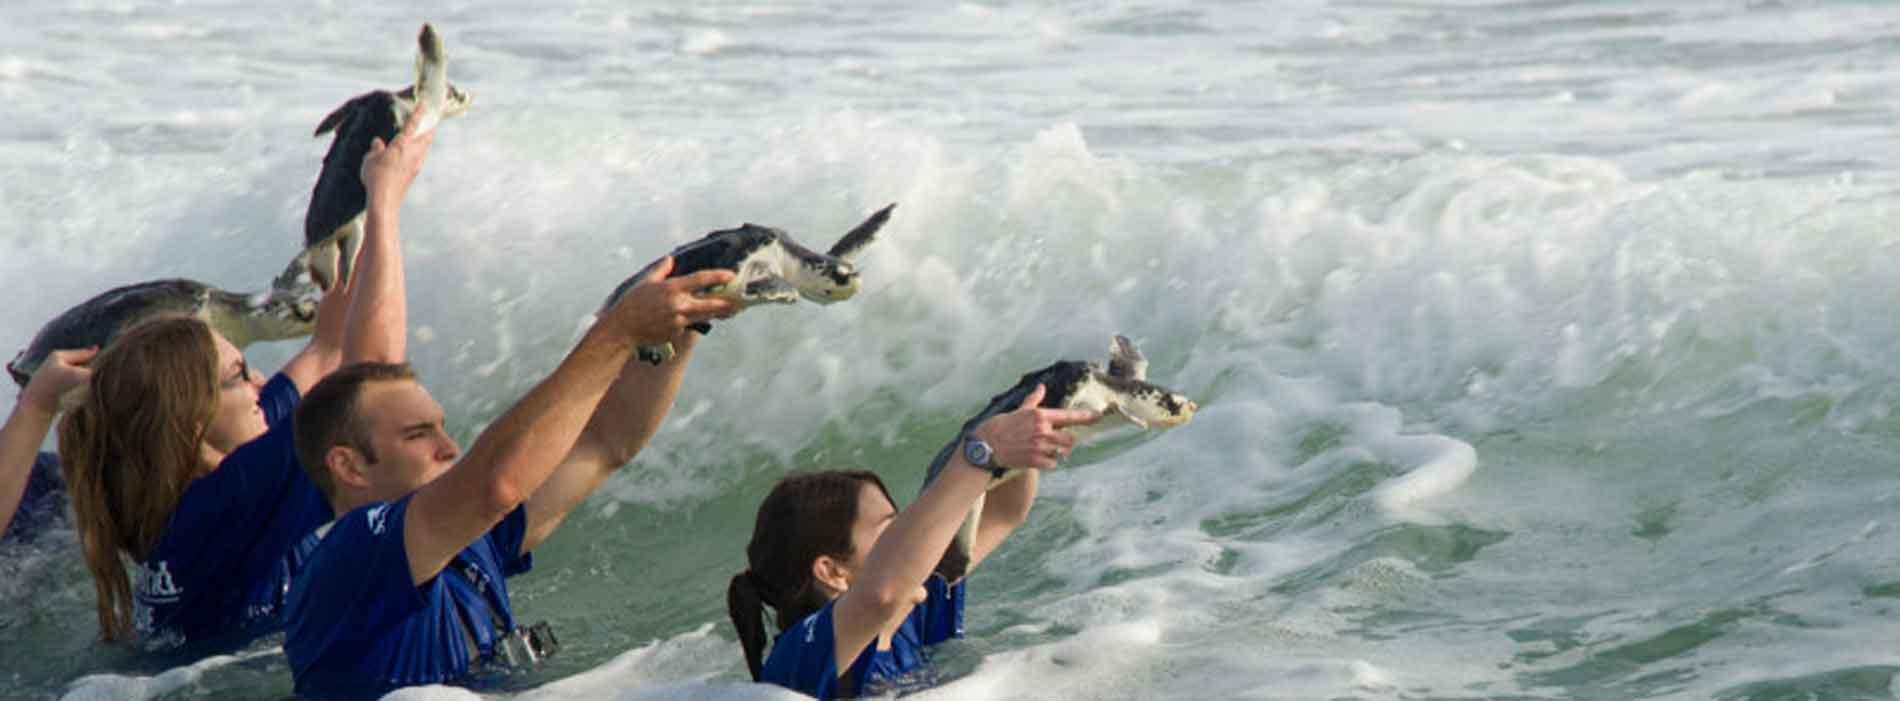 Releasing three sea turtles in the waves